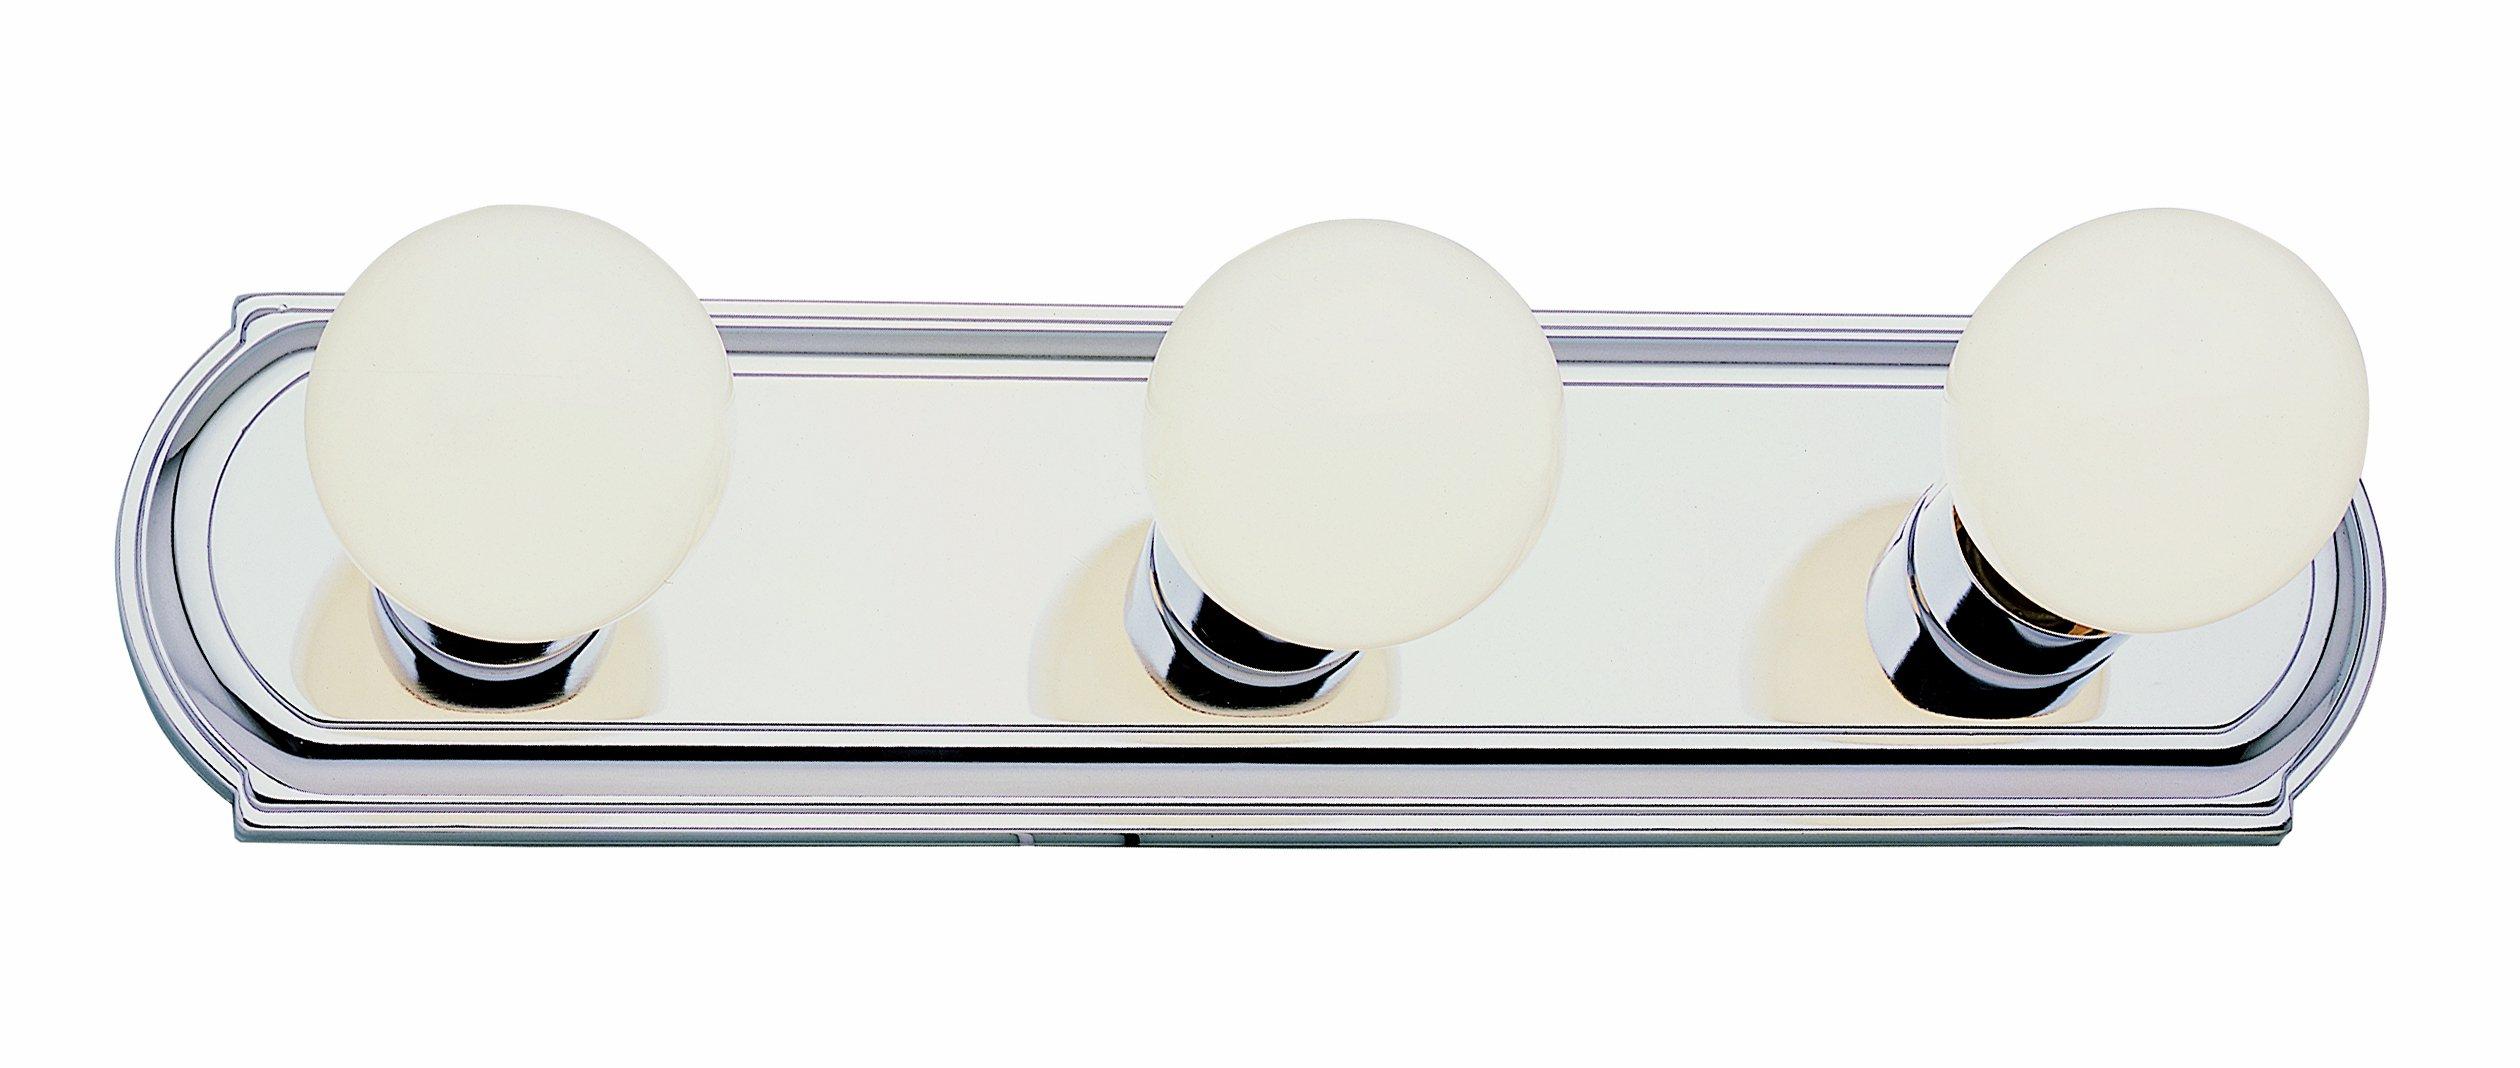 Trans Globe Lighting 3218 ROB 3-Light Racetrack Bar Bathroom Light Fixture, Rubbed Oil Bronze